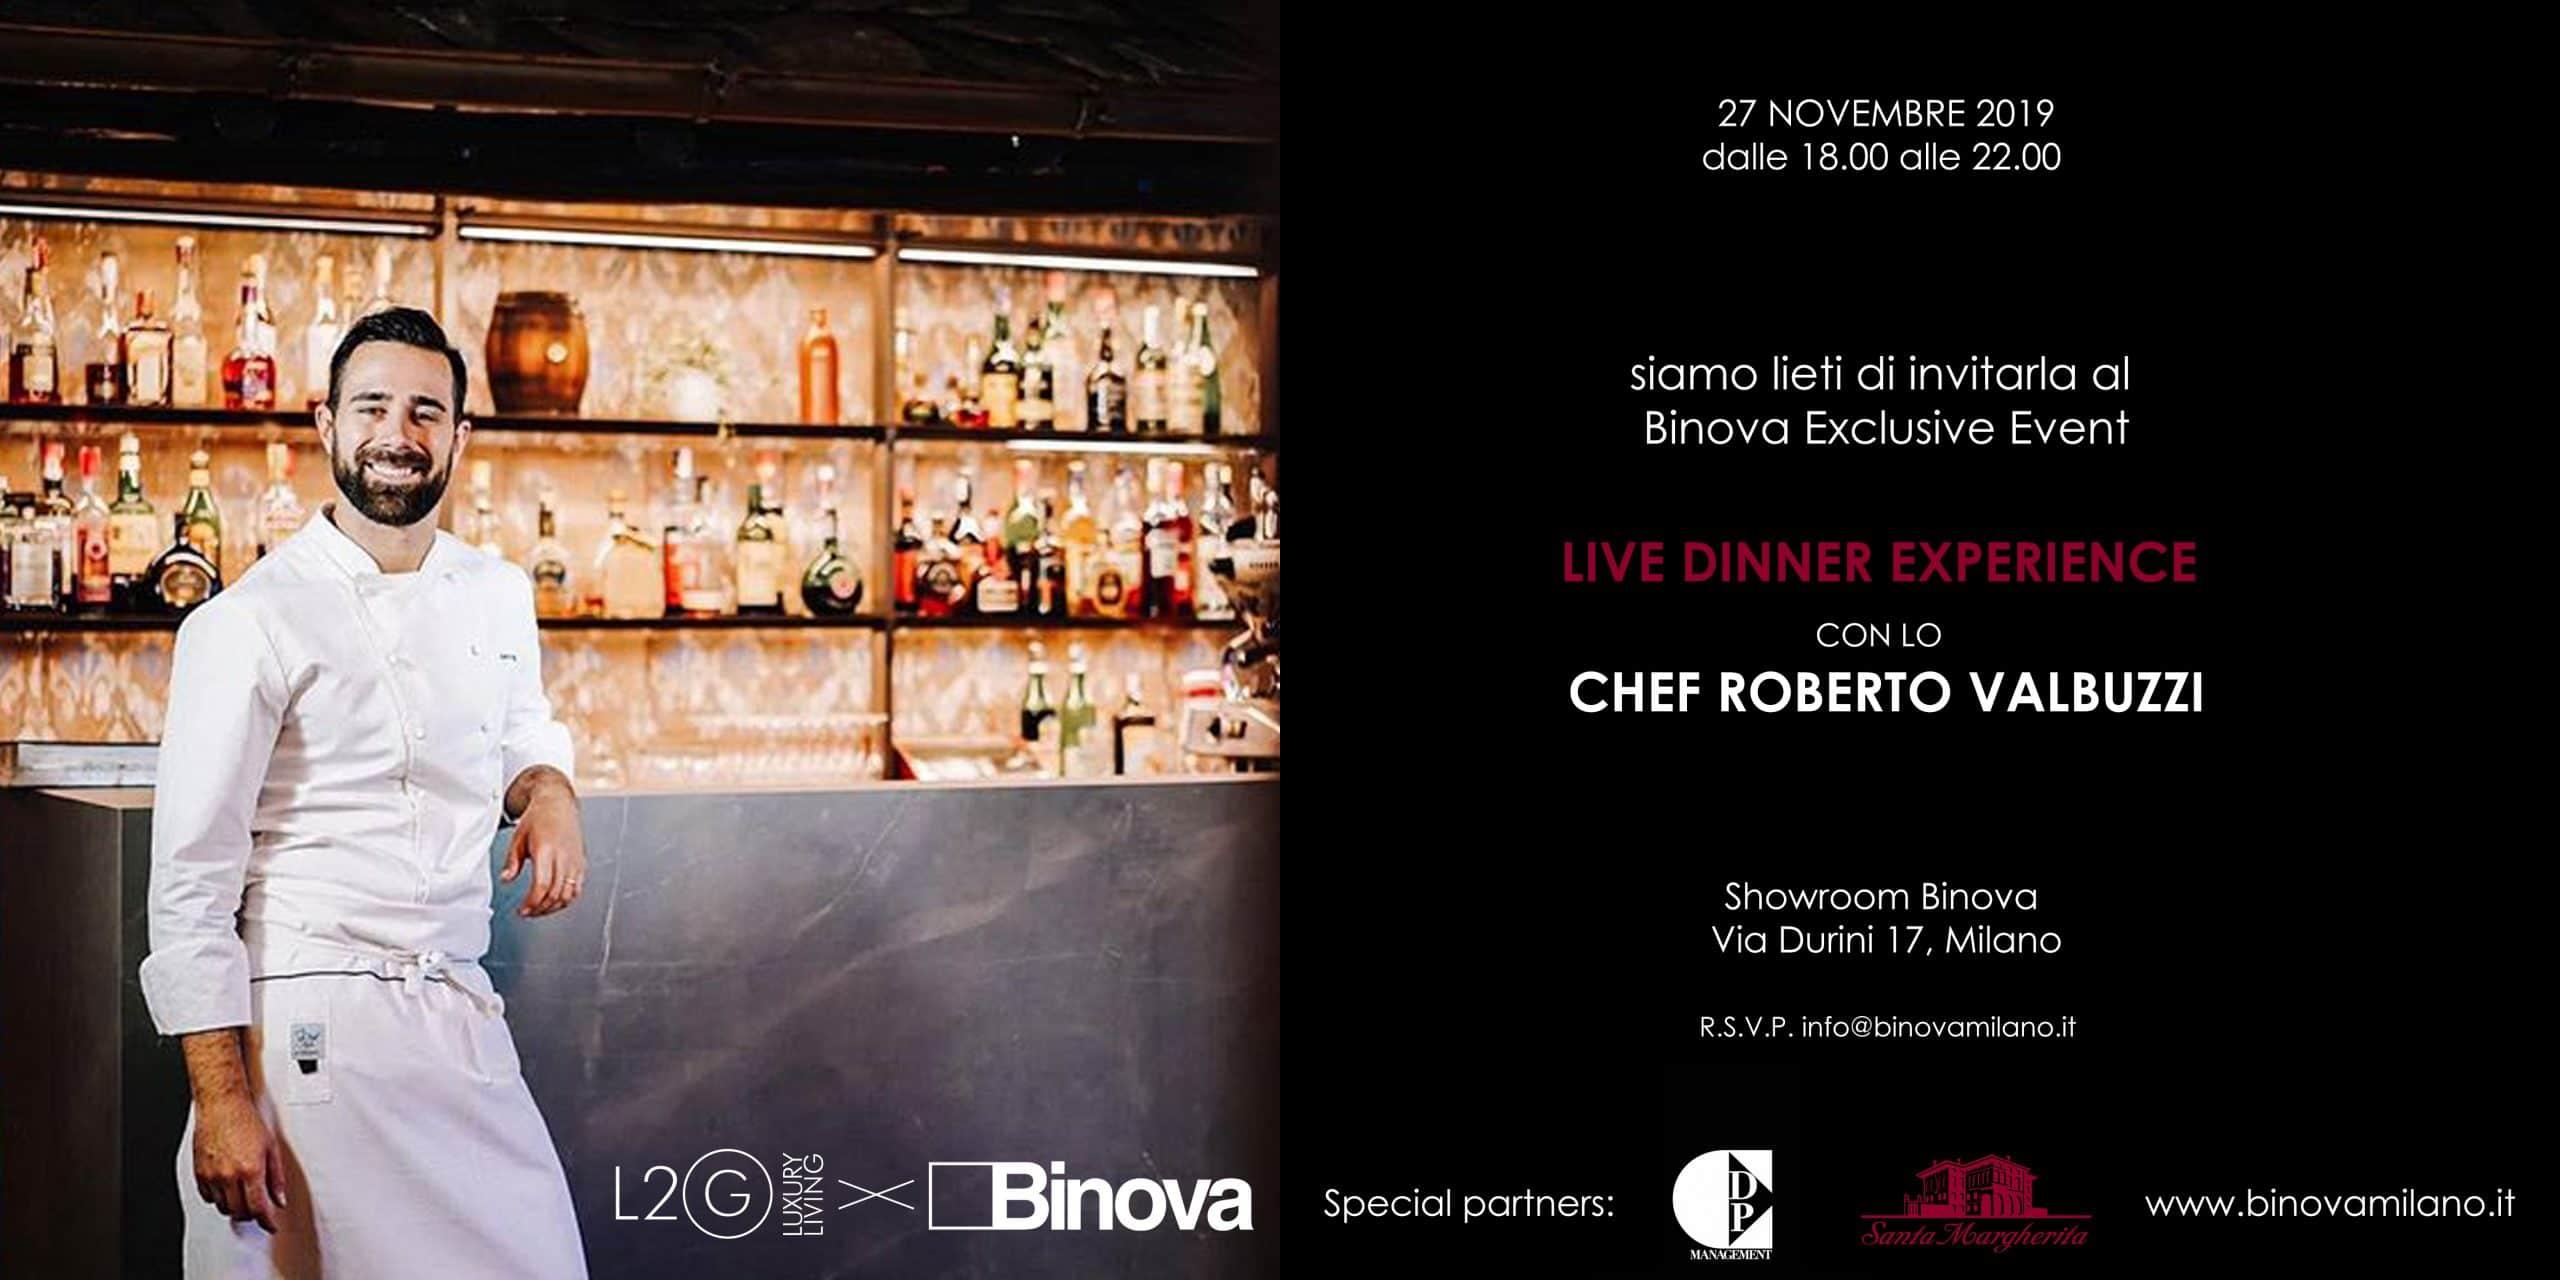 binova live dinner experience roberto valbuzzi